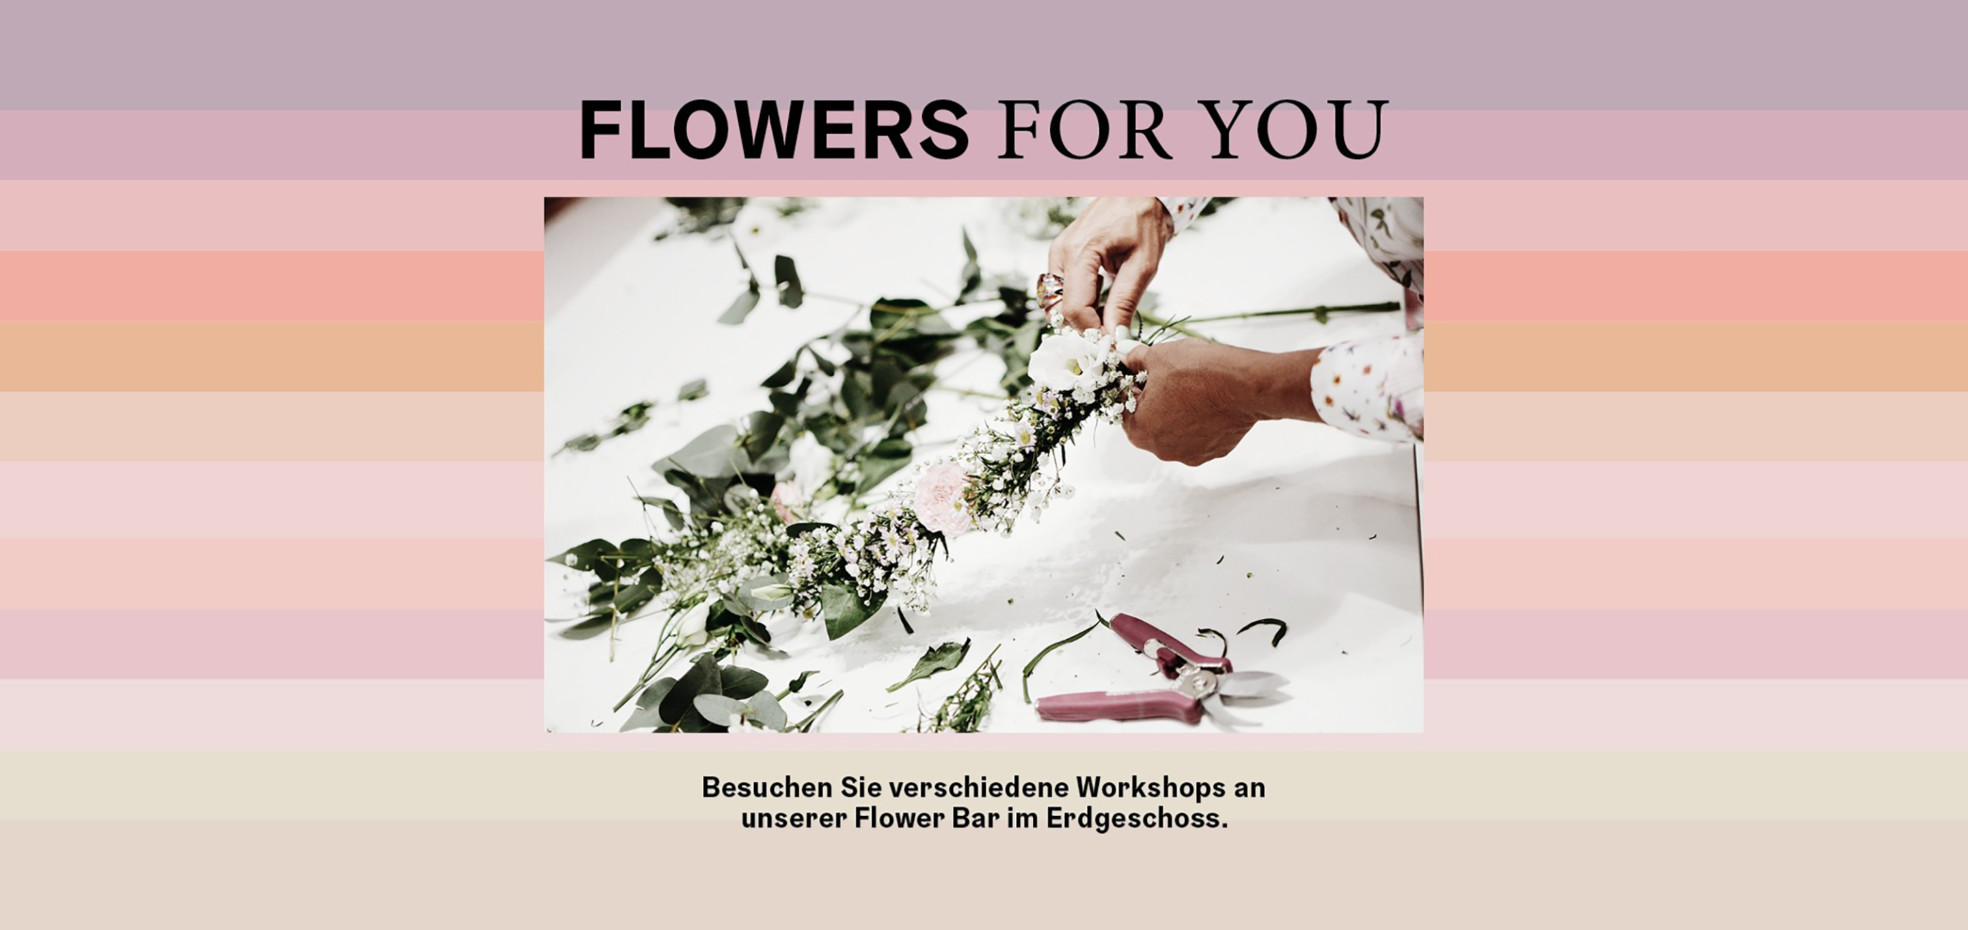 Flower_Workshop_OPO-Juni19_WS_Desktopteaser_kompletter Text_neue Maße